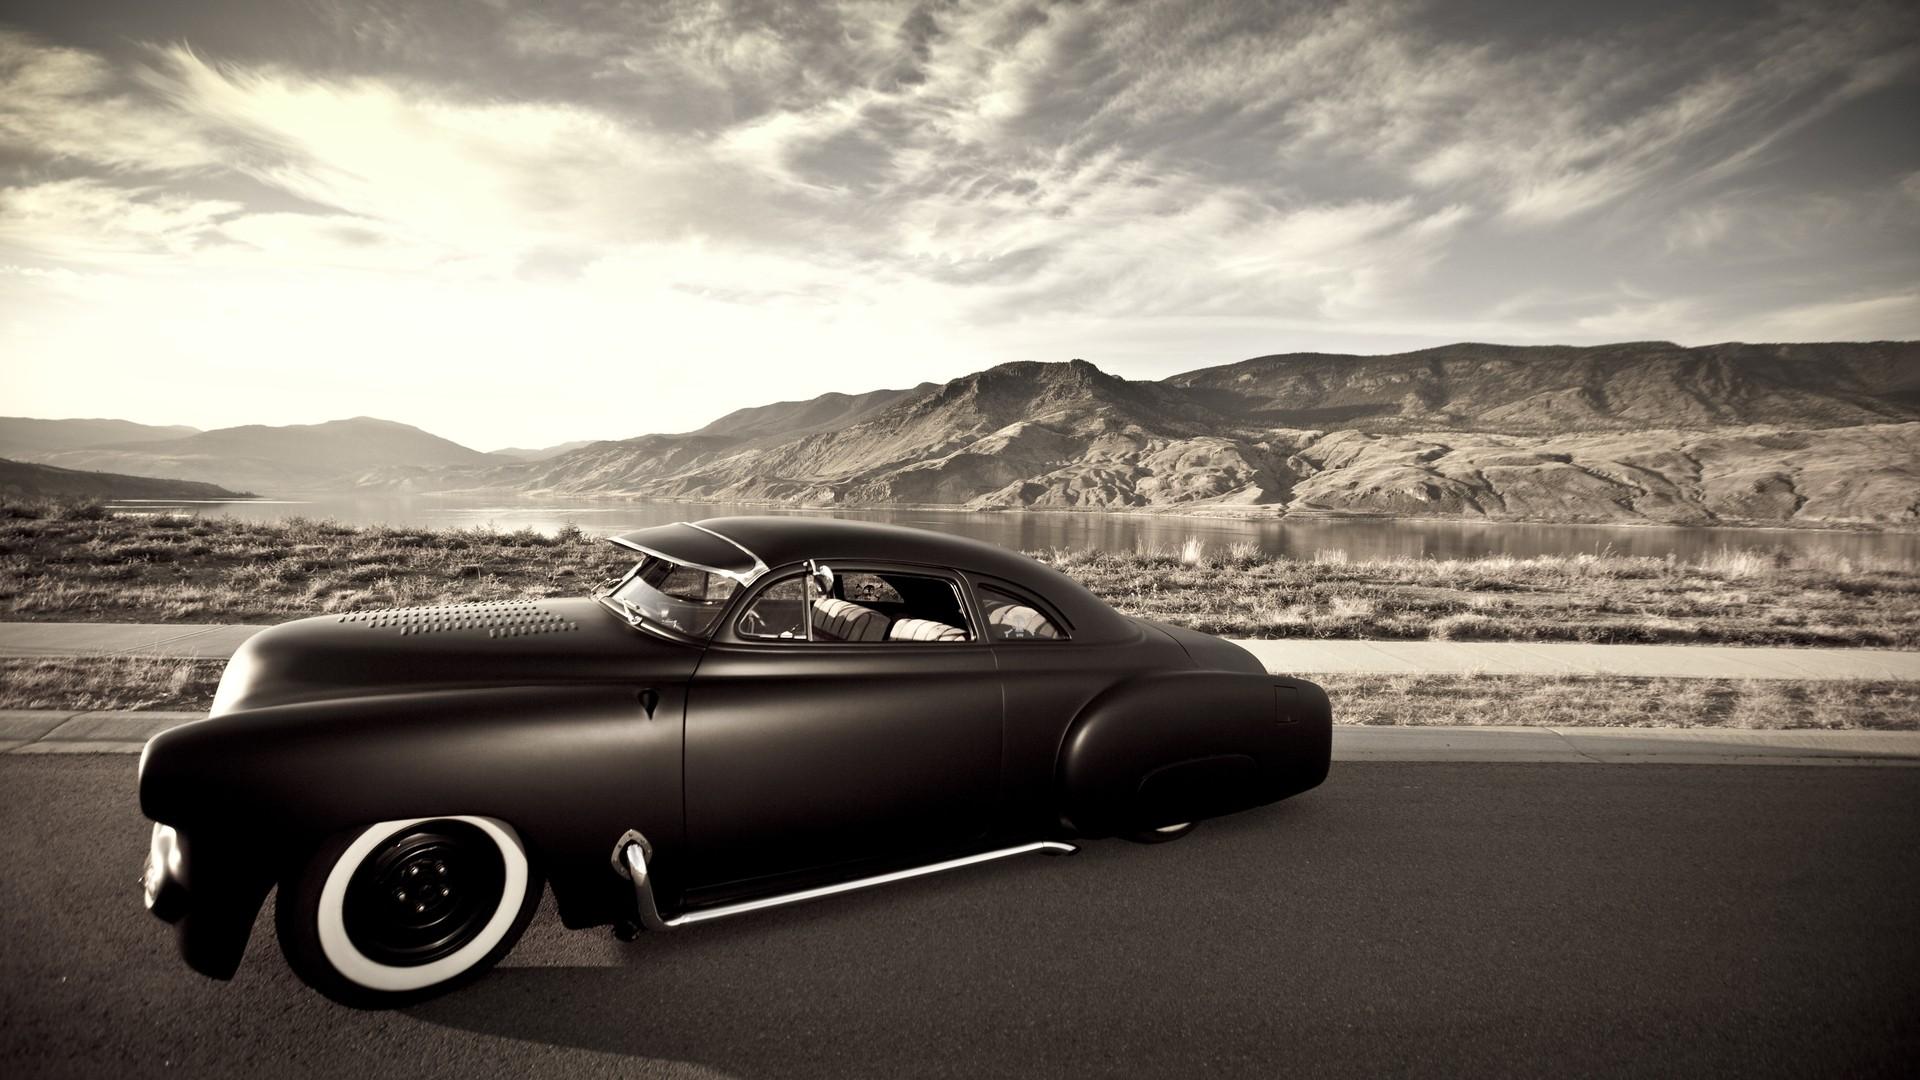 Muscle Car Hot Rod - HD Wallpaper